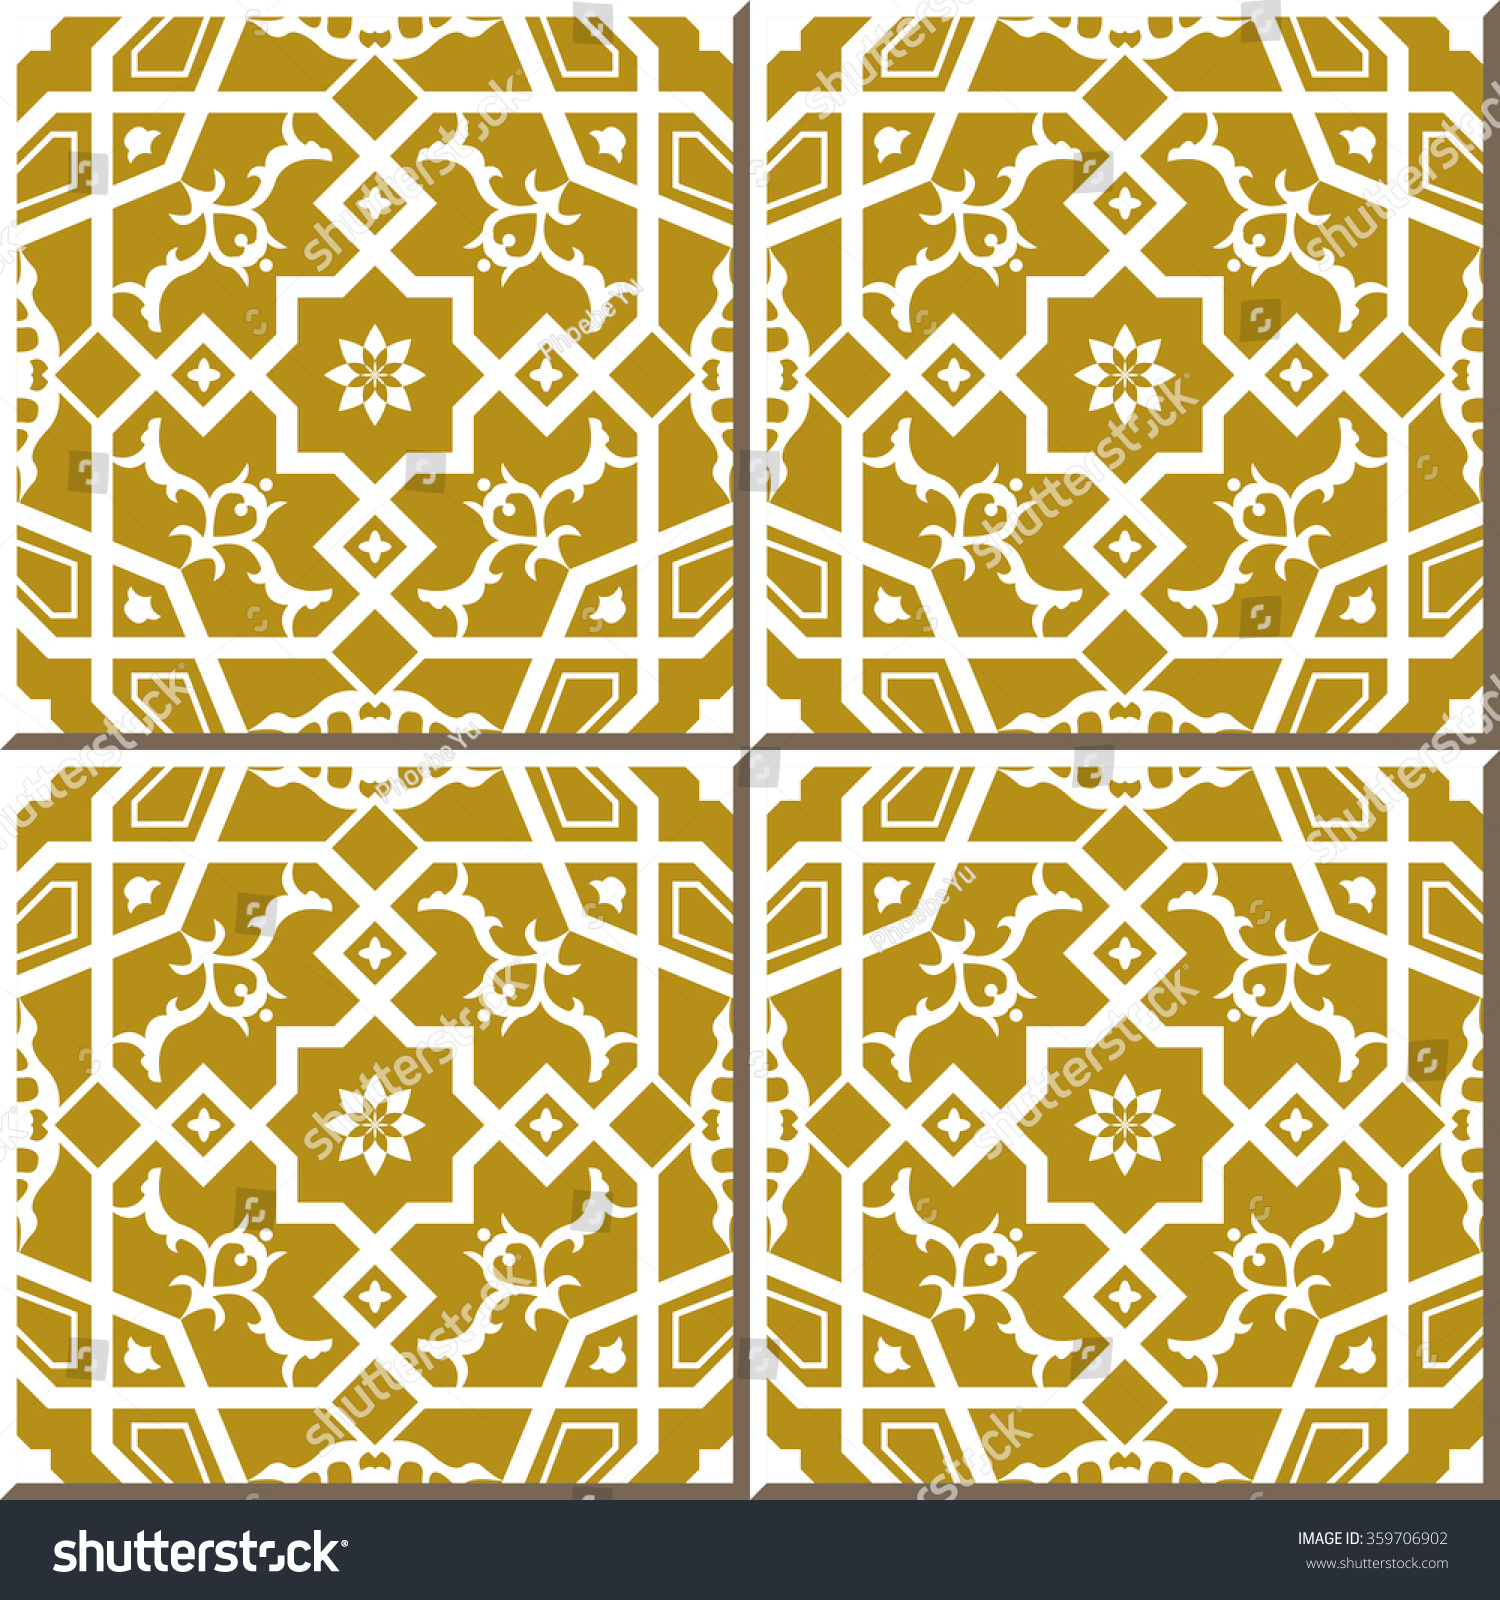 Vintage Seamless Wall Tiles Cross Polygon Stock Vector HD (Royalty ...